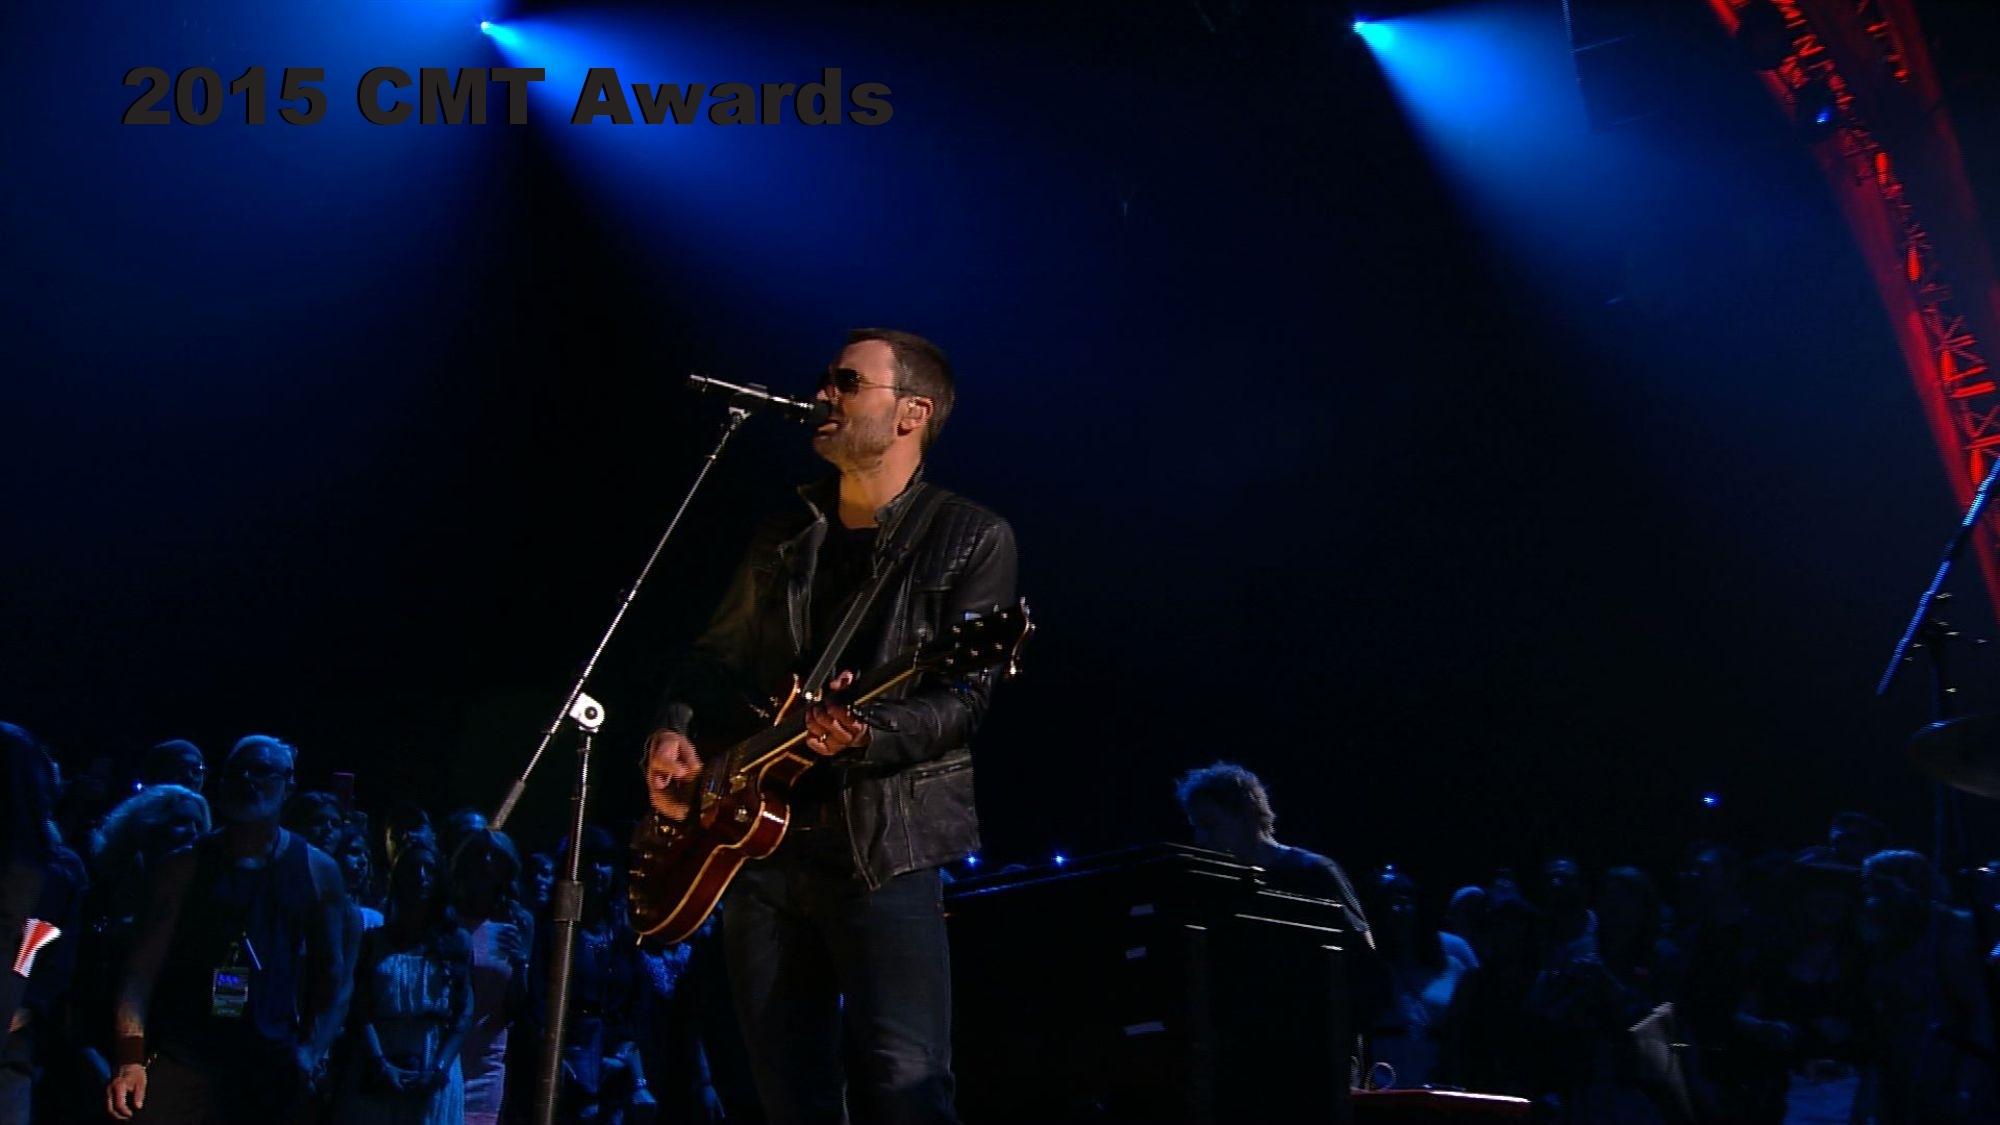 2015 CMT Awards